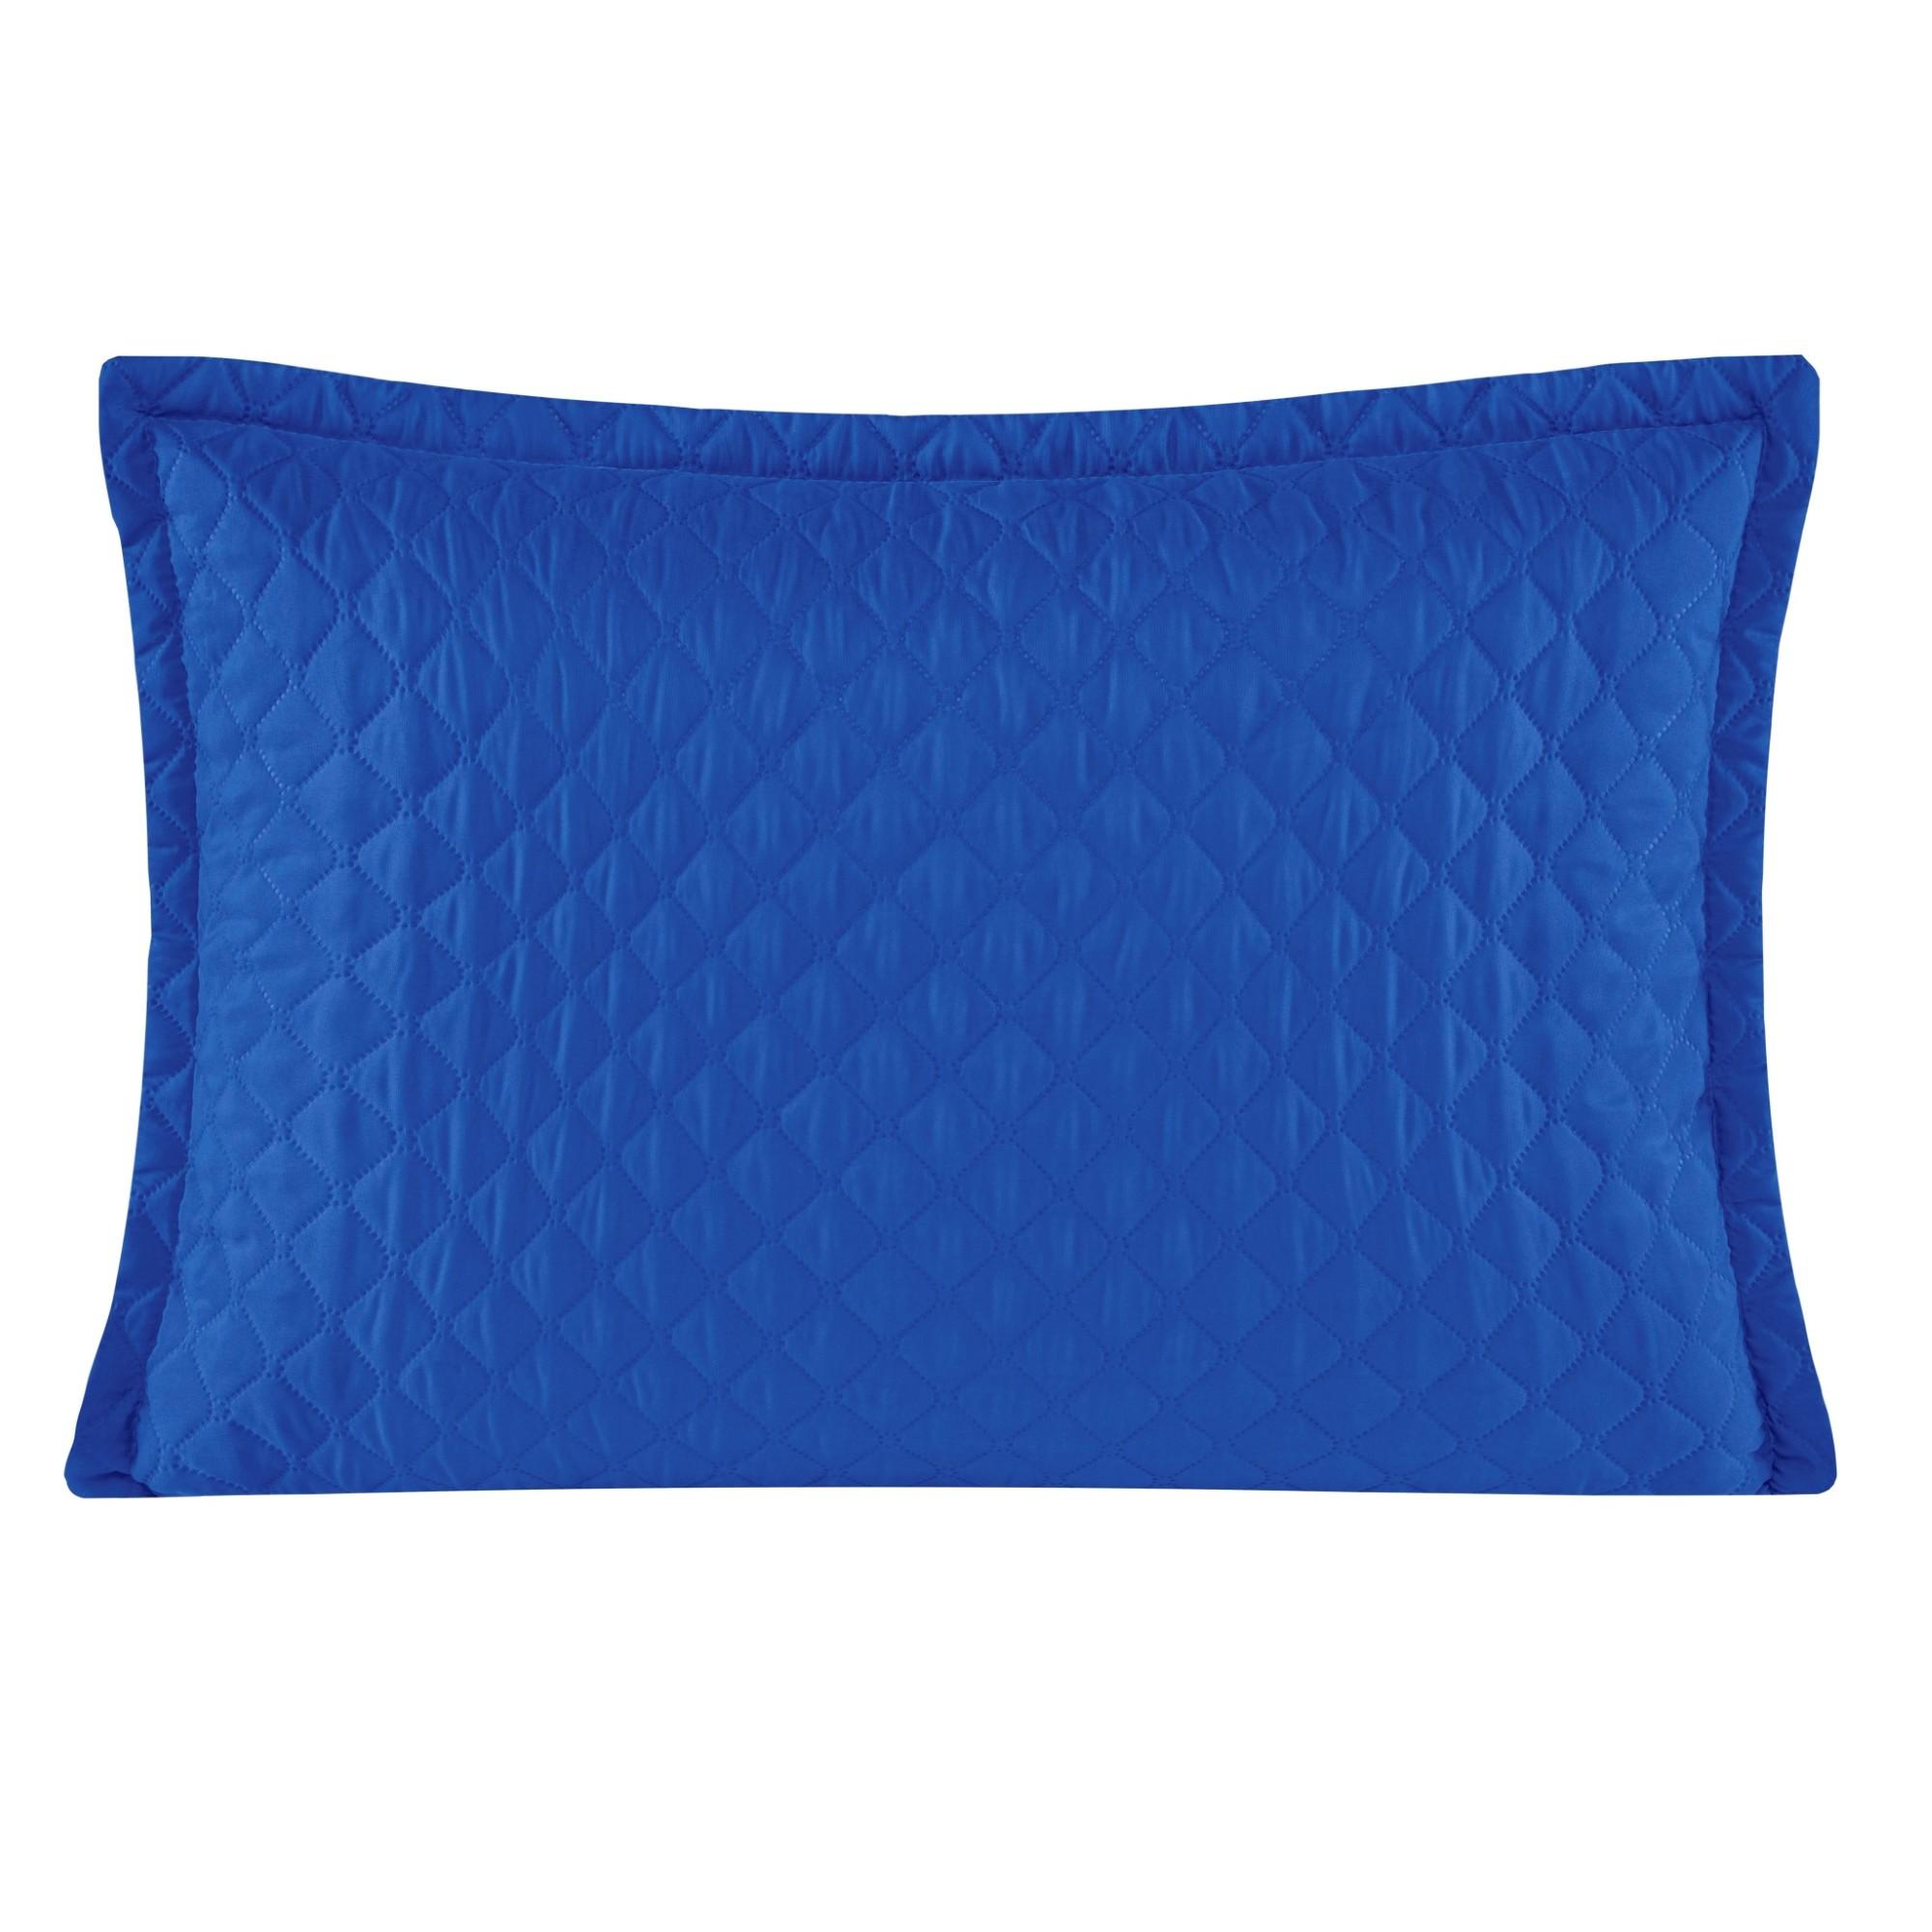 Porta Travesseiro 50x70 cm Delicata Azul - Yohana